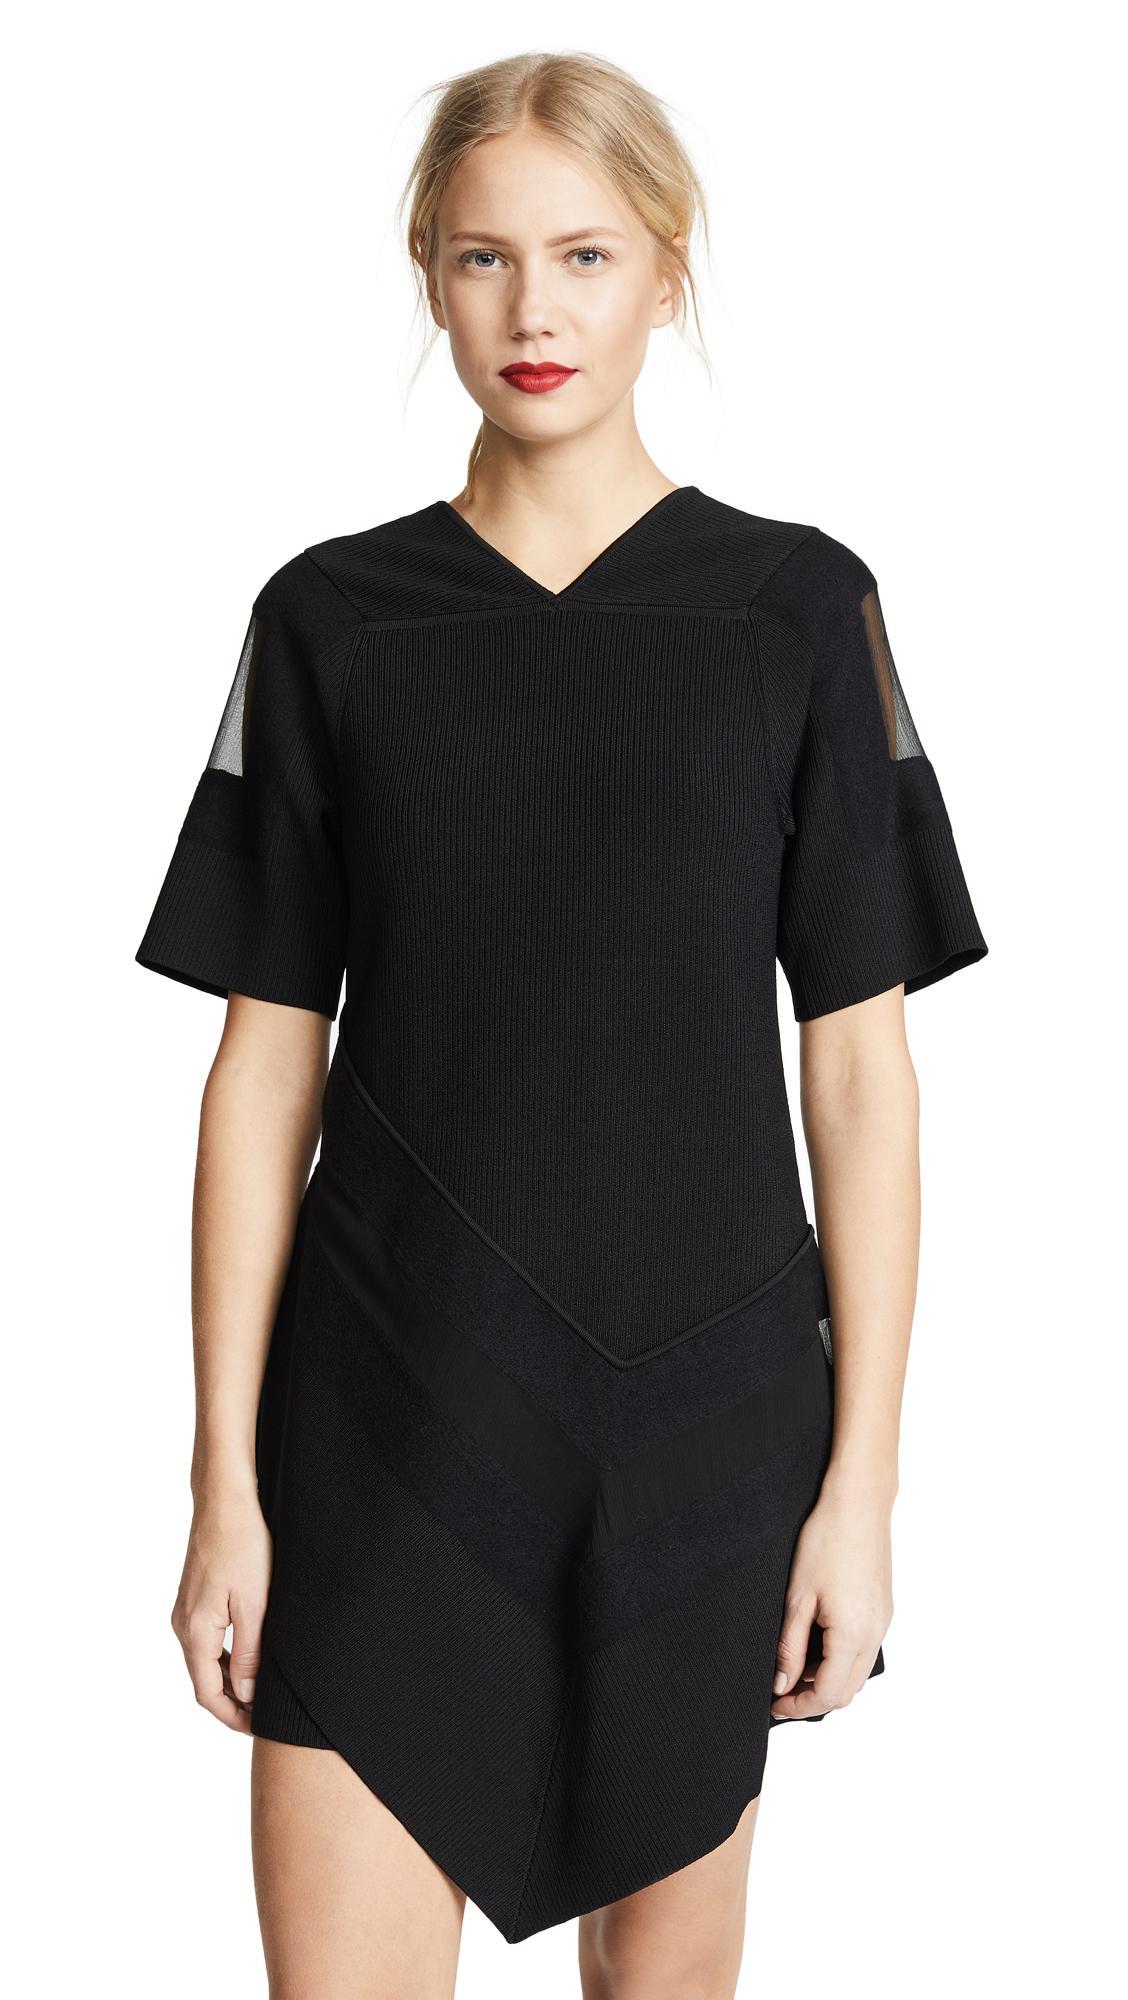 f9de62ef02a1f5 3.1 Phillip Lim Needle Punch Handkerchief Dress In Black   ModeSens